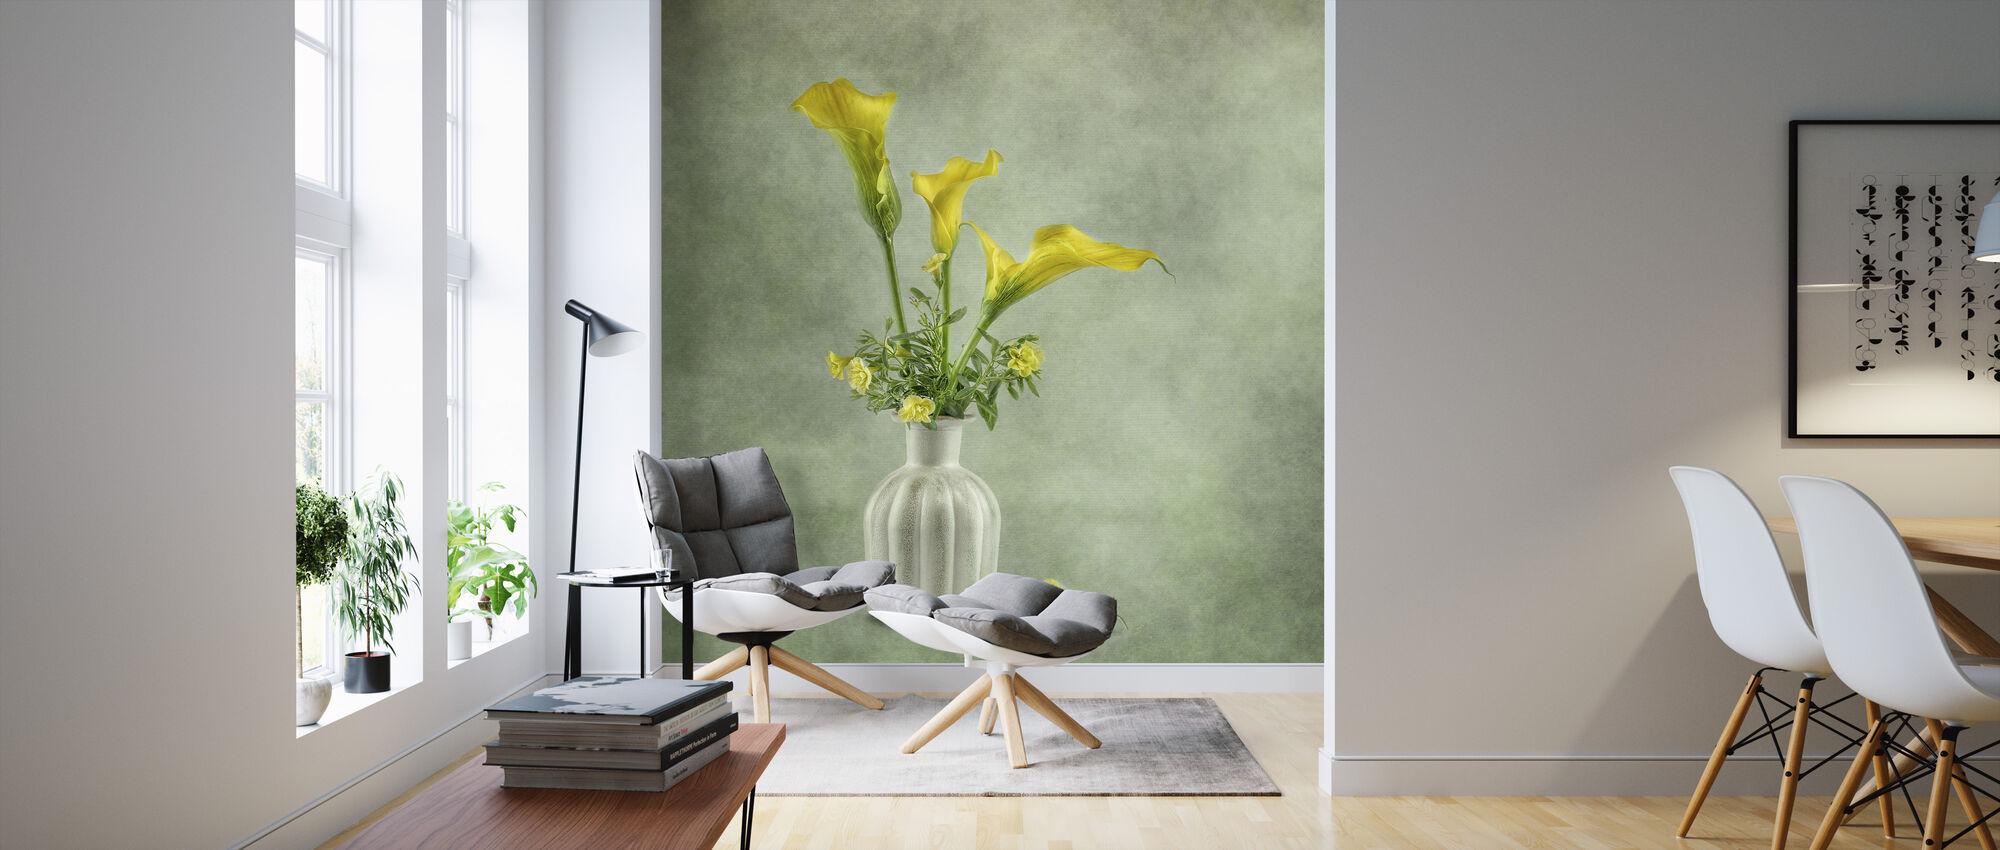 Calia Lillies - Wallpaper - Living Room